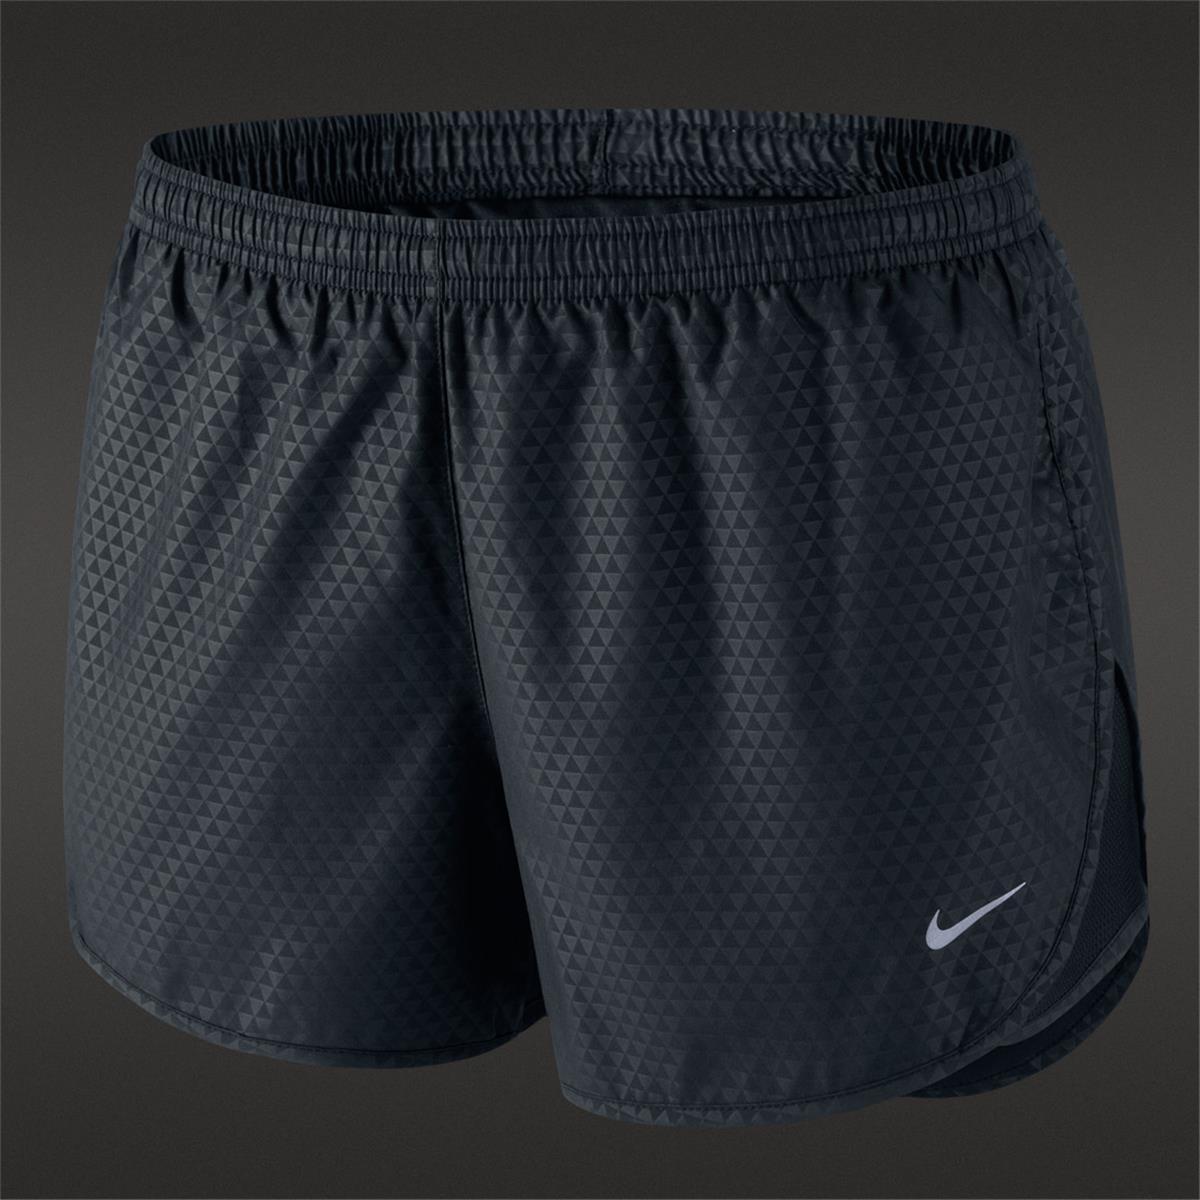 Compartirsantillana Nike Santillana Compartir All Shorts Black Womens fqx6AUn